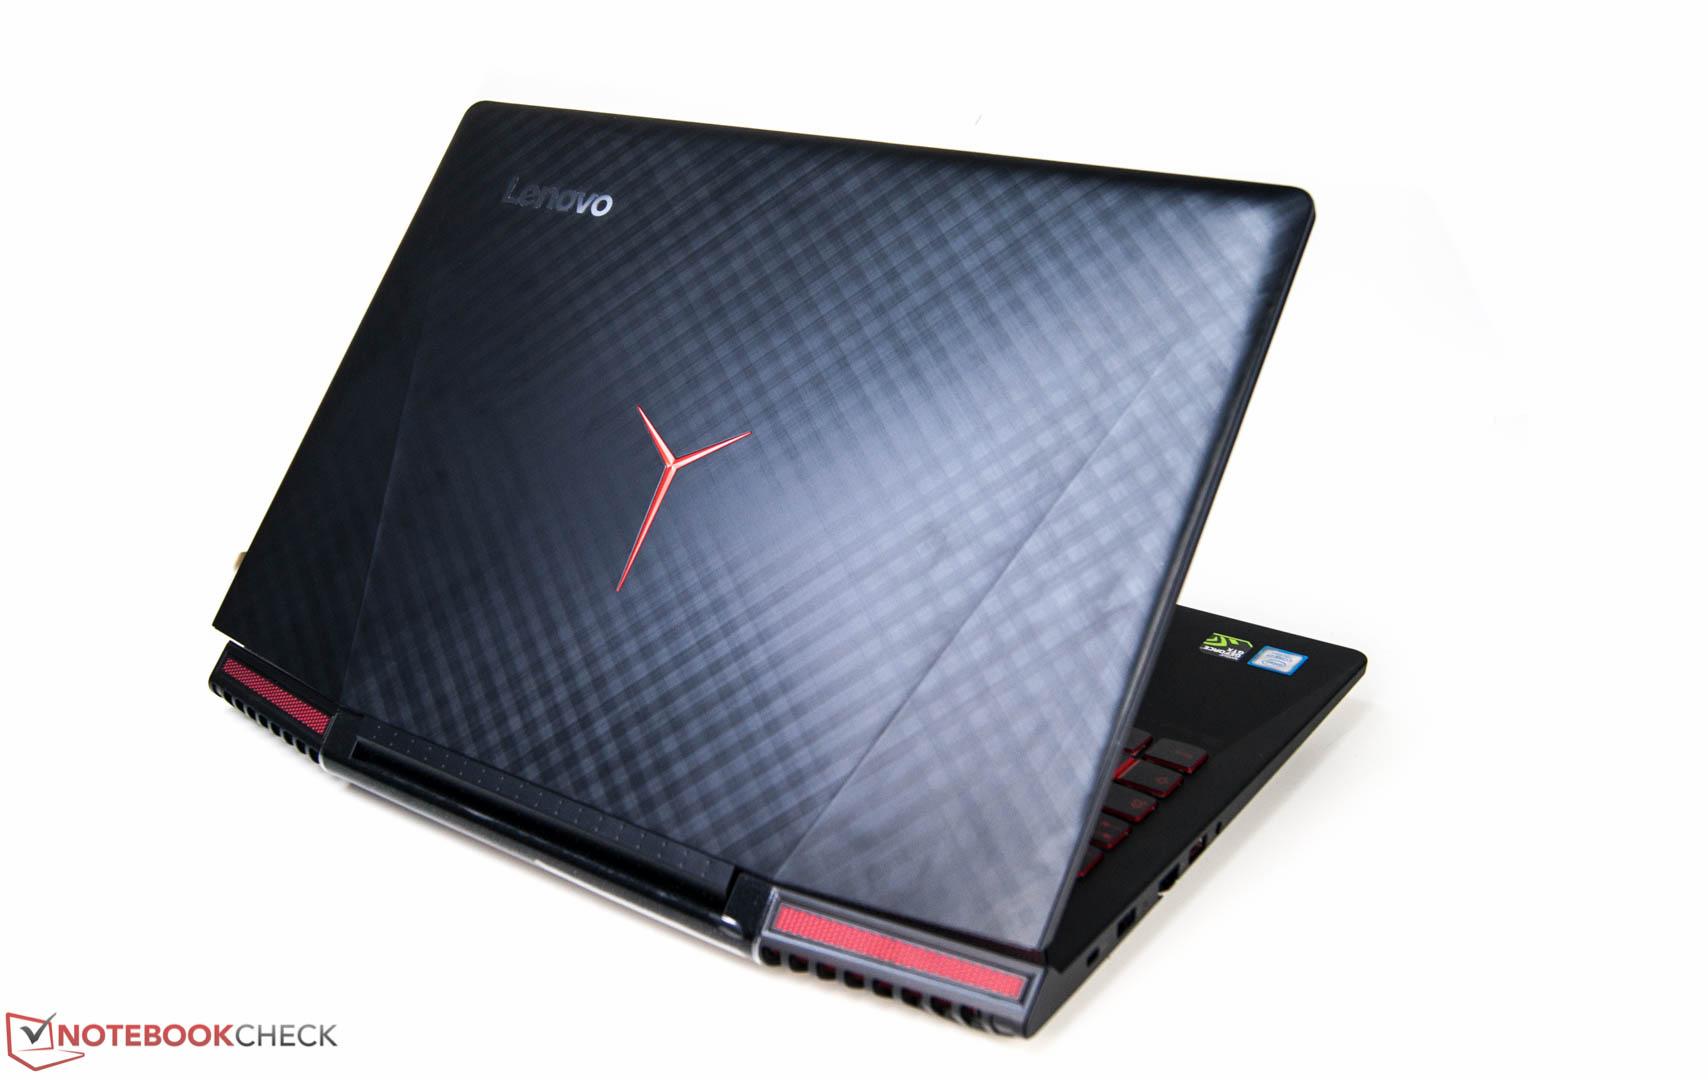 Lenovo Legion Y720 7700hq Full Hd Gtx 1060 Laptop Review Microsoft Surface Pro Type Cover Black Fingerprint Bnib The Logo On Back